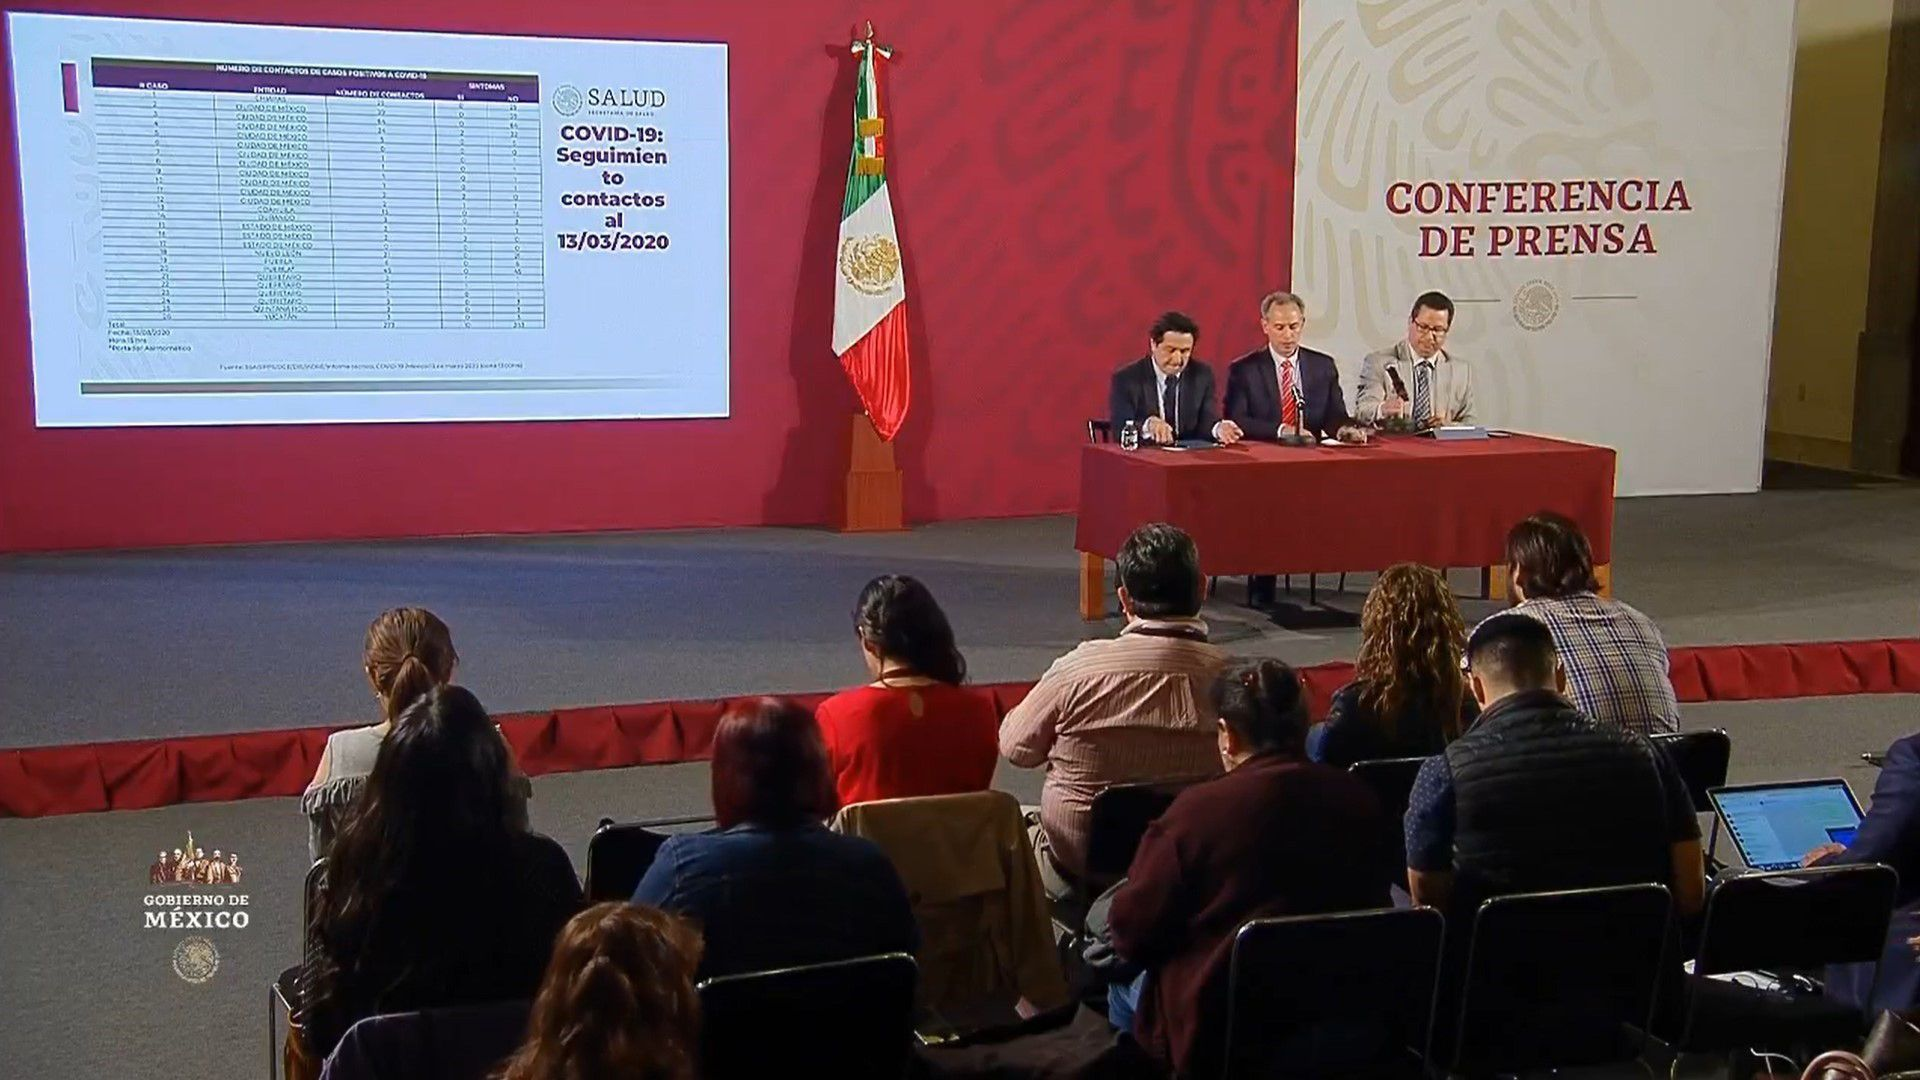 En conferencia de prensa, autoridades de salud confirmaron que ya son 26 casos de coronavirus en México (Foto: Captura de pantalla)